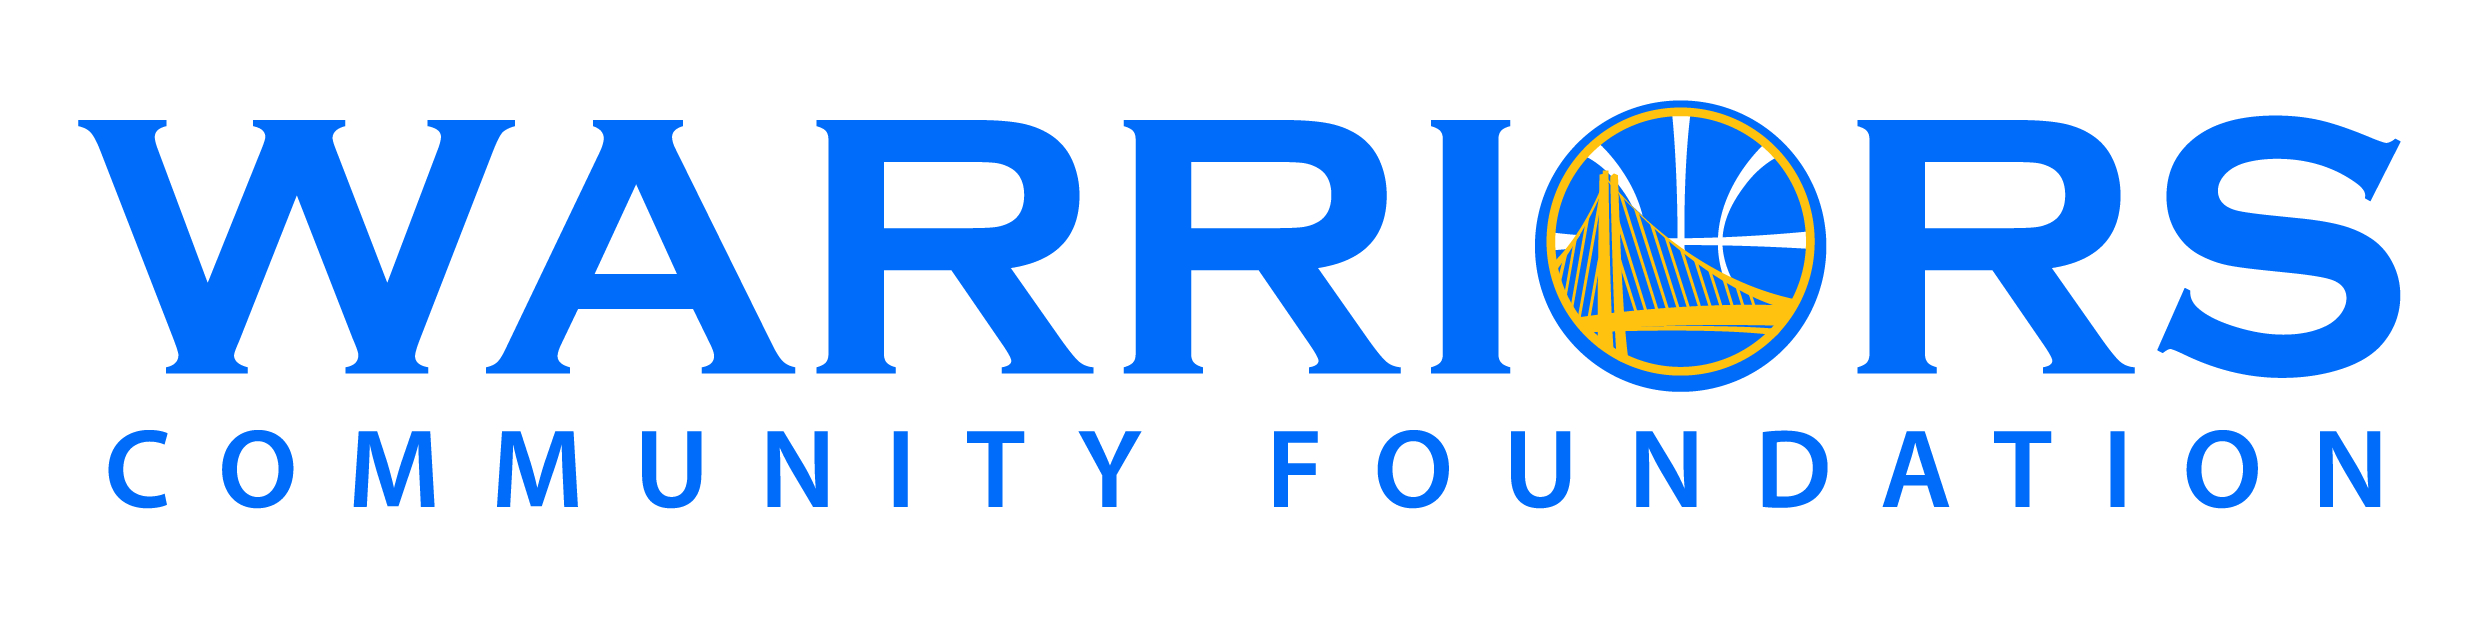 Warriors Community Foundation logo